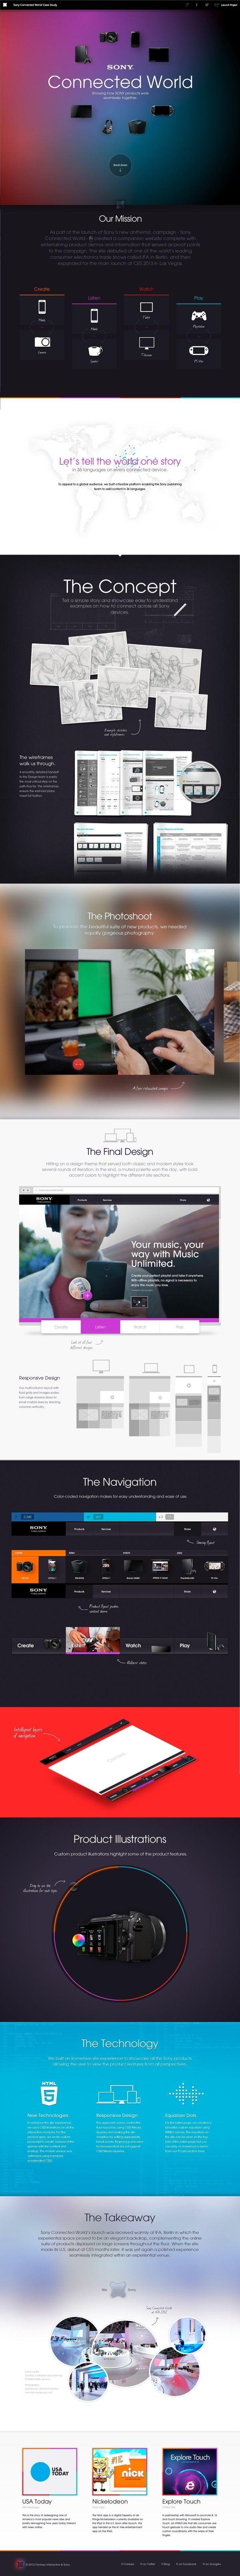 Sony Connected World: Case Study by chris rubin, via Behance